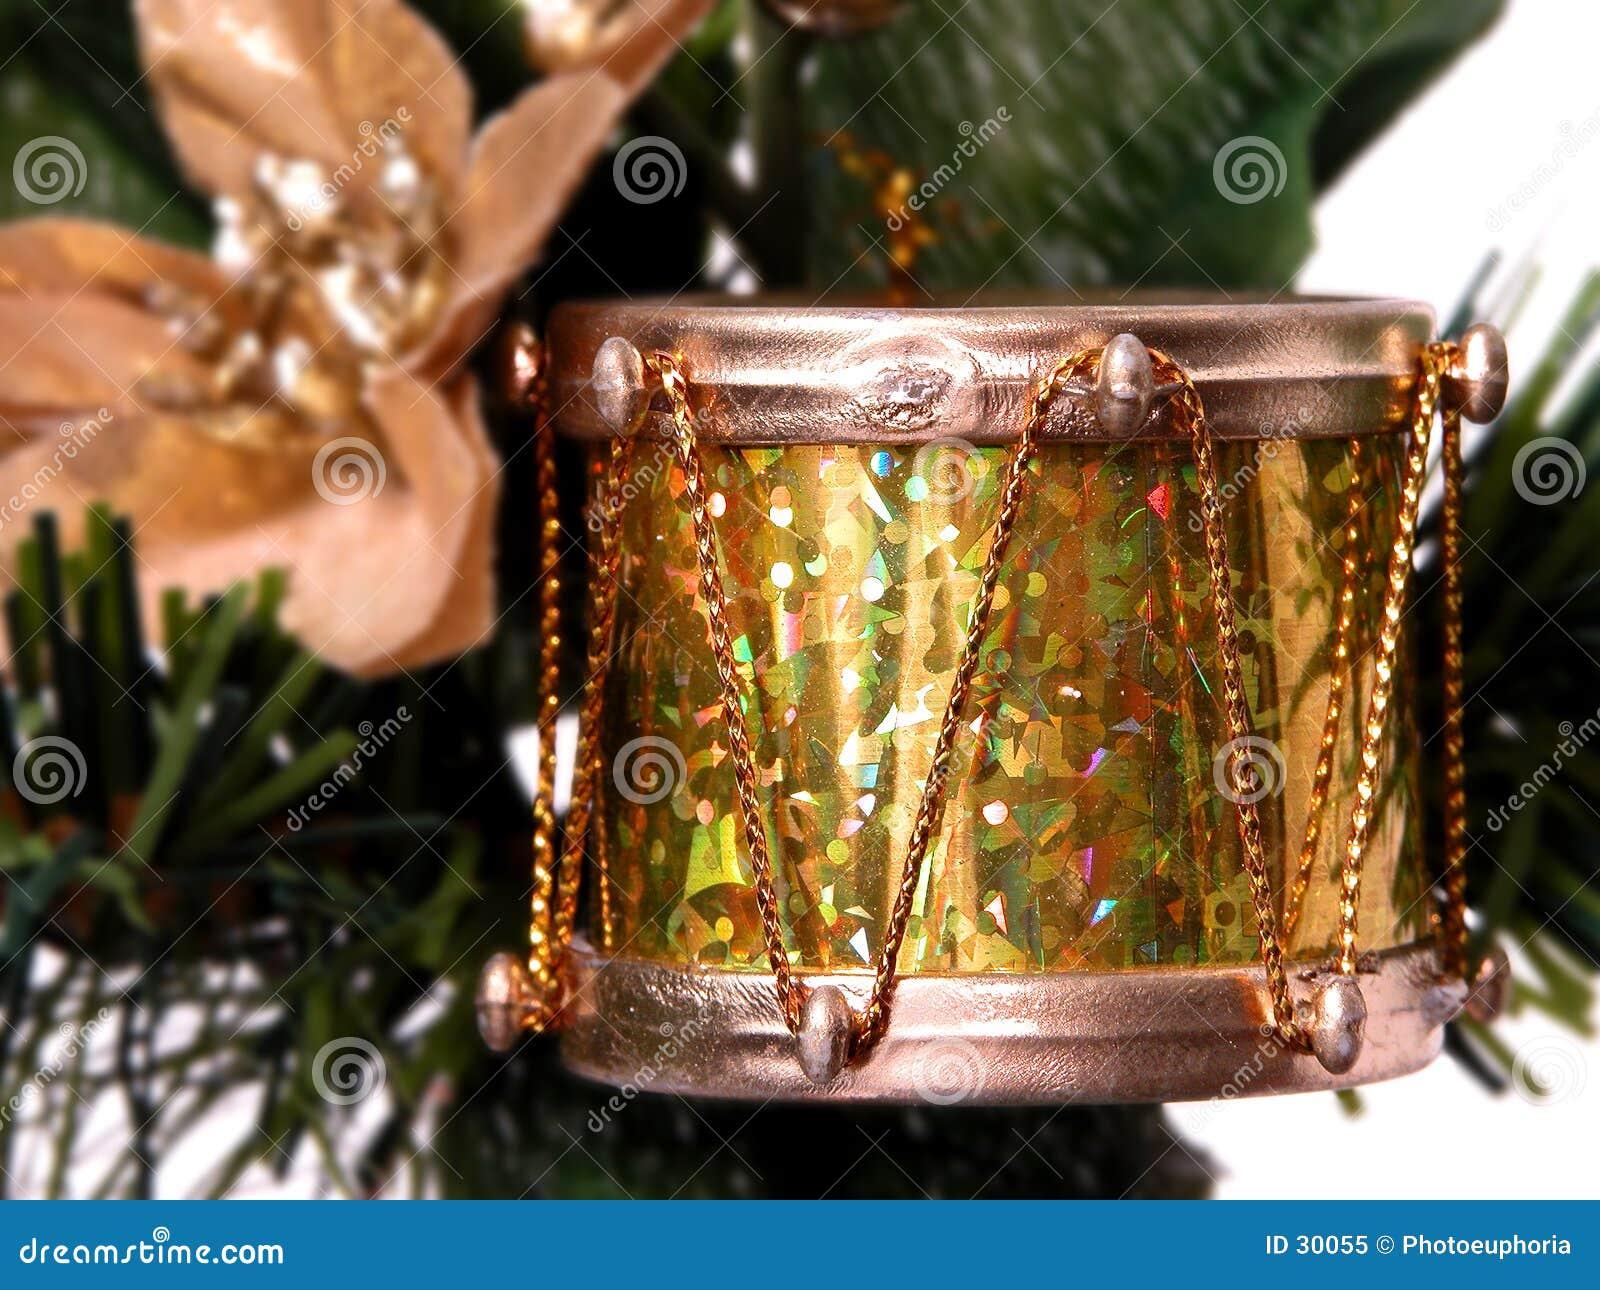 Feiertag u. Saison: Glänzende Goldfolien-Trommel